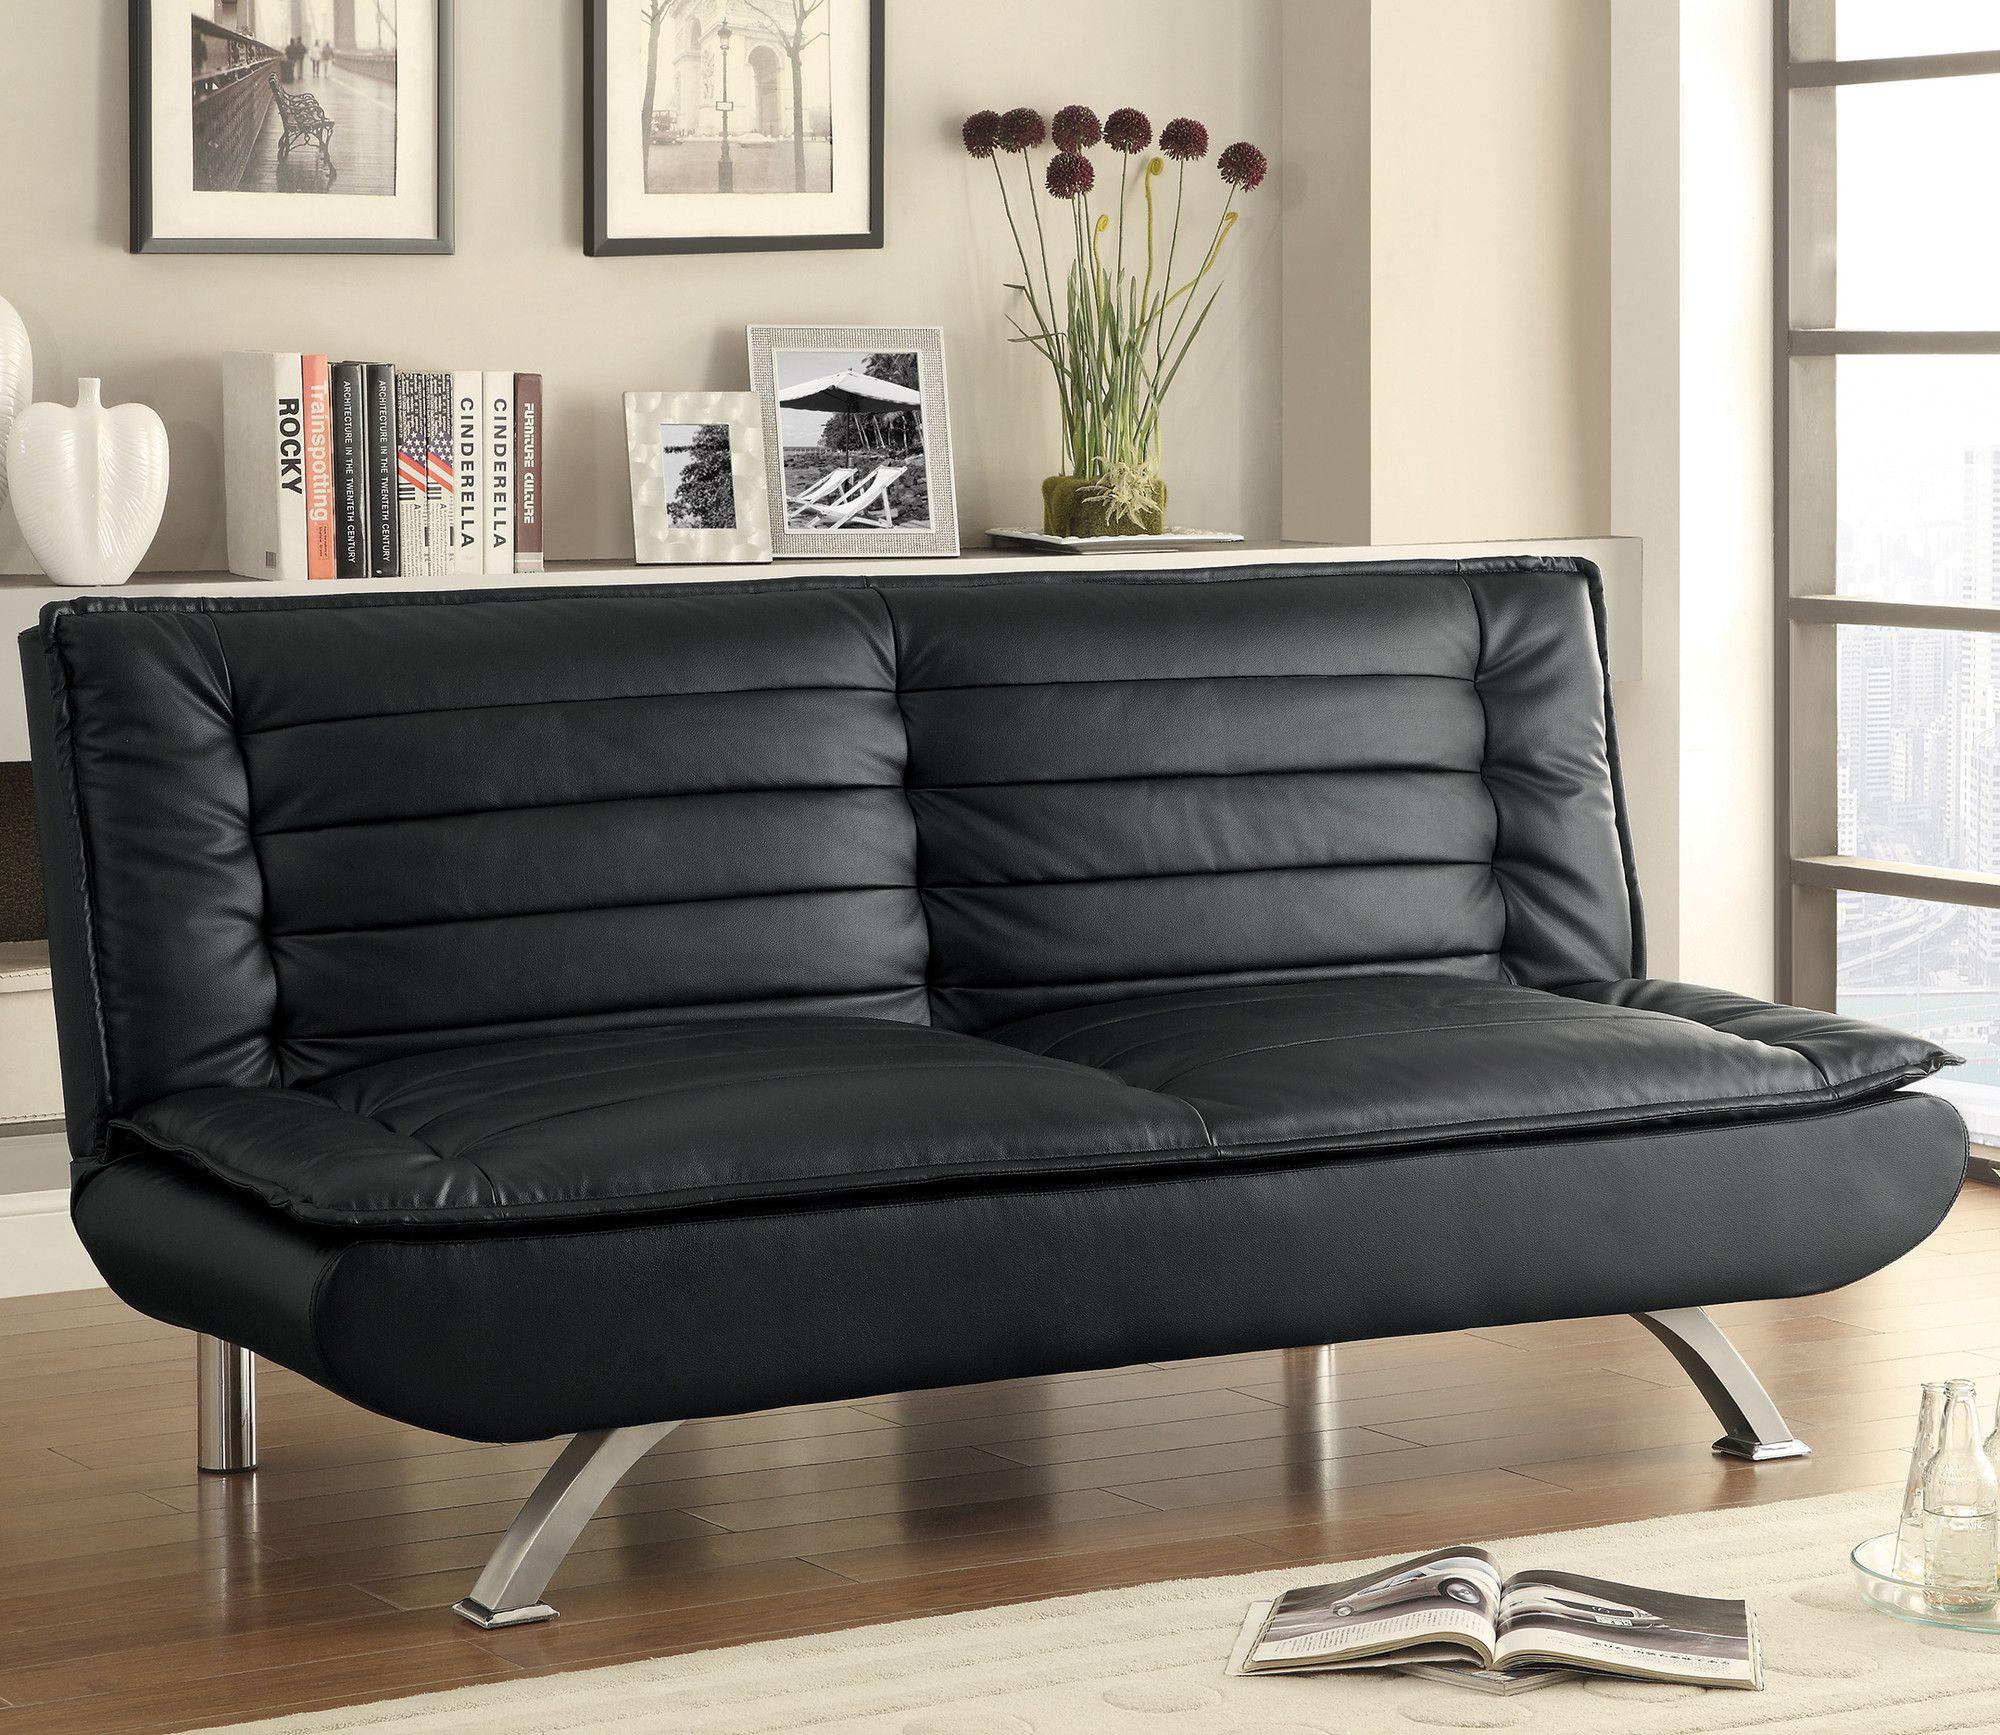 Leather Sleeper Sofa Products Pinterest